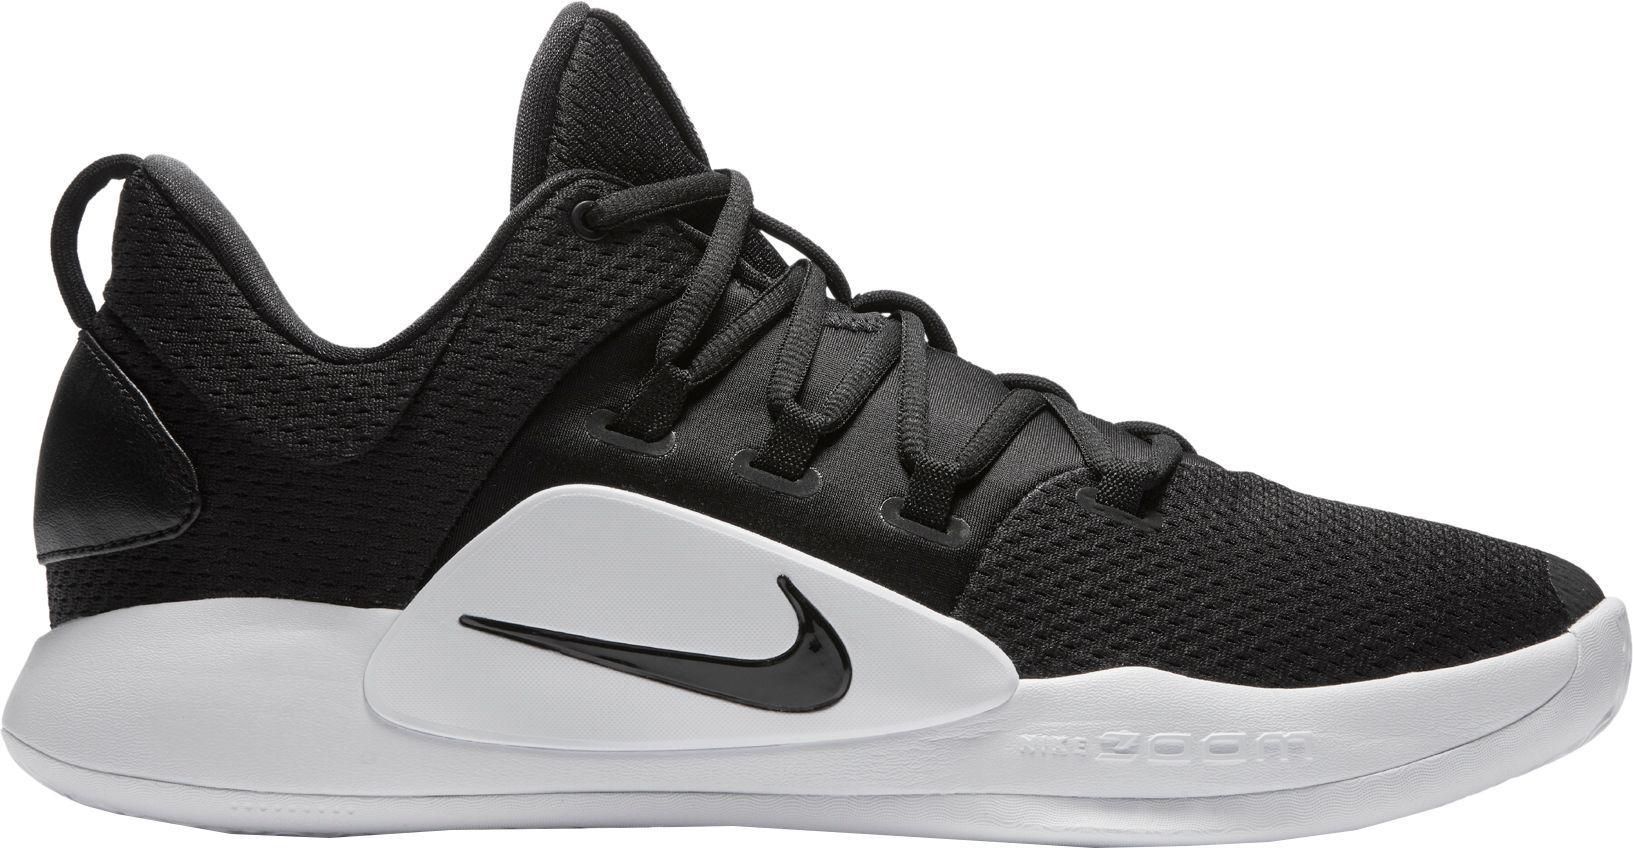 finest selection a0019 ce385 Nike Men s Hyperdunk X Low TB Basketball Shoes, Size  17, Black